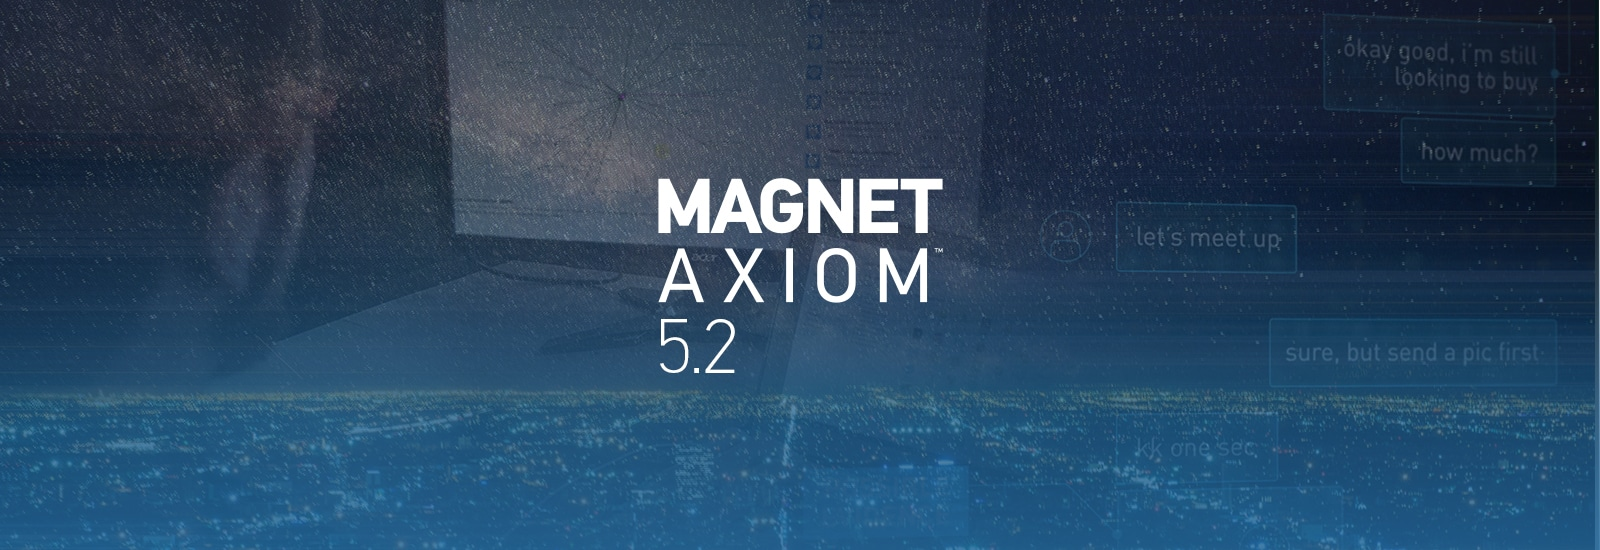 AXIOM 5.2